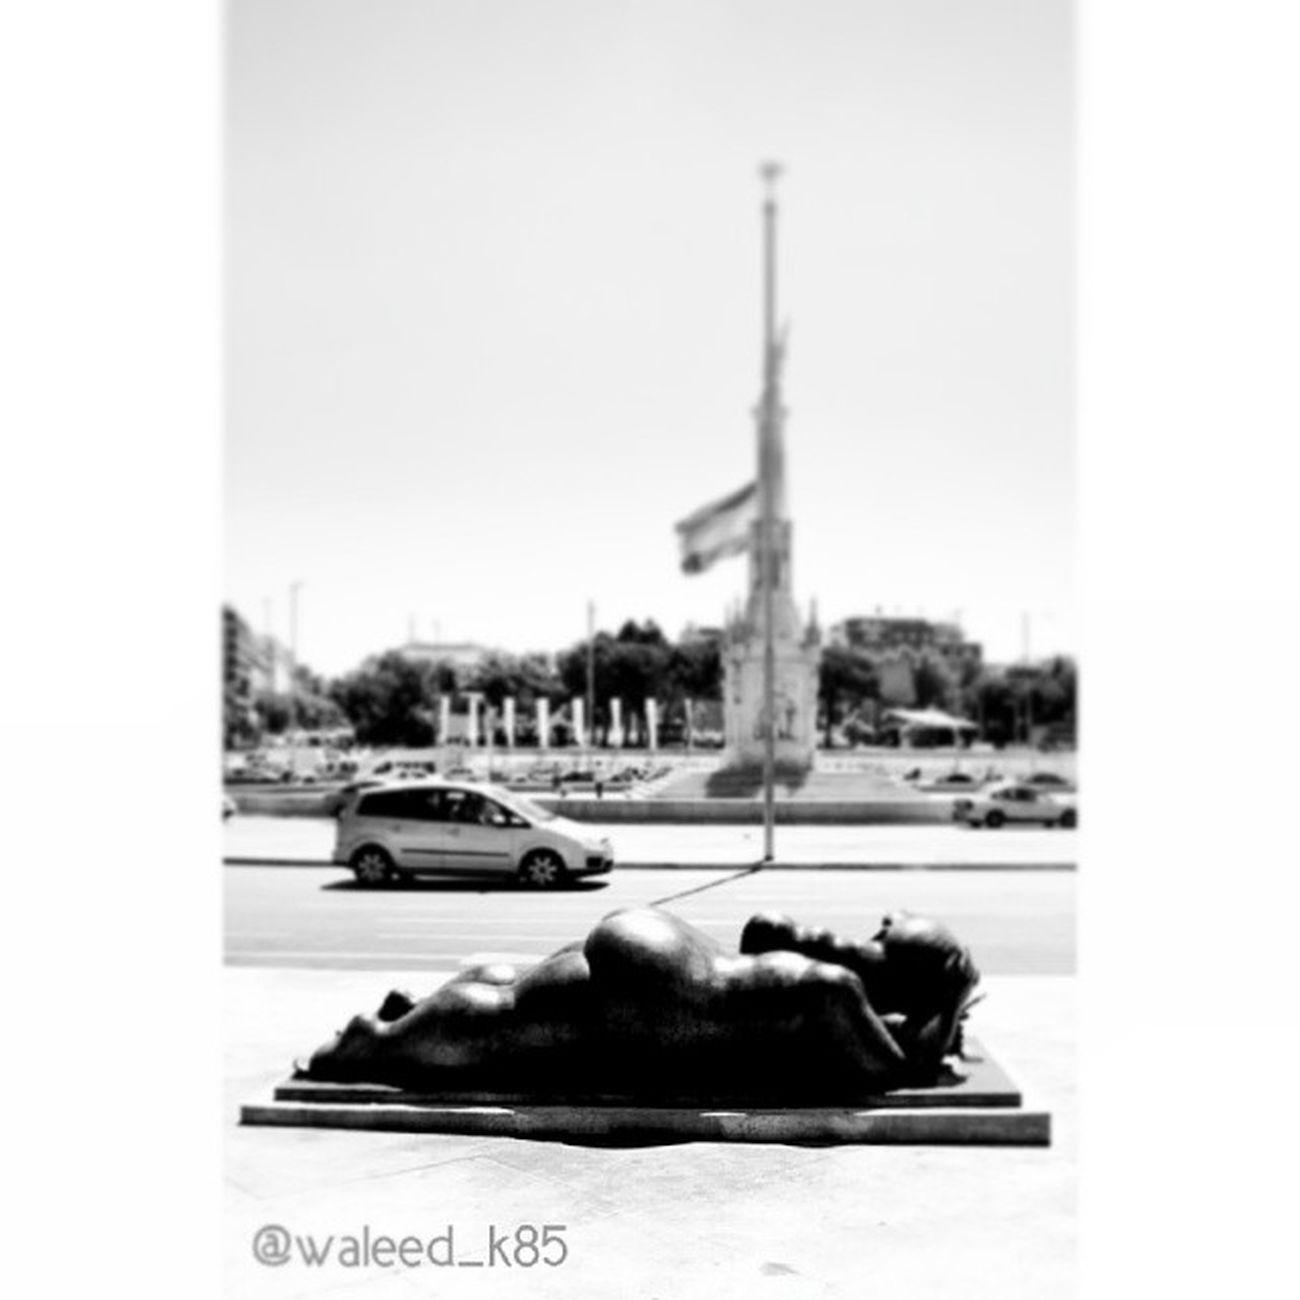 Statue at the Plazacolon Plaza_colón . Madrid Spain españa. Taken by my sonyalpha dslr a200. Taken in my 2010 summer trip مدريد اسبانيا تمثال